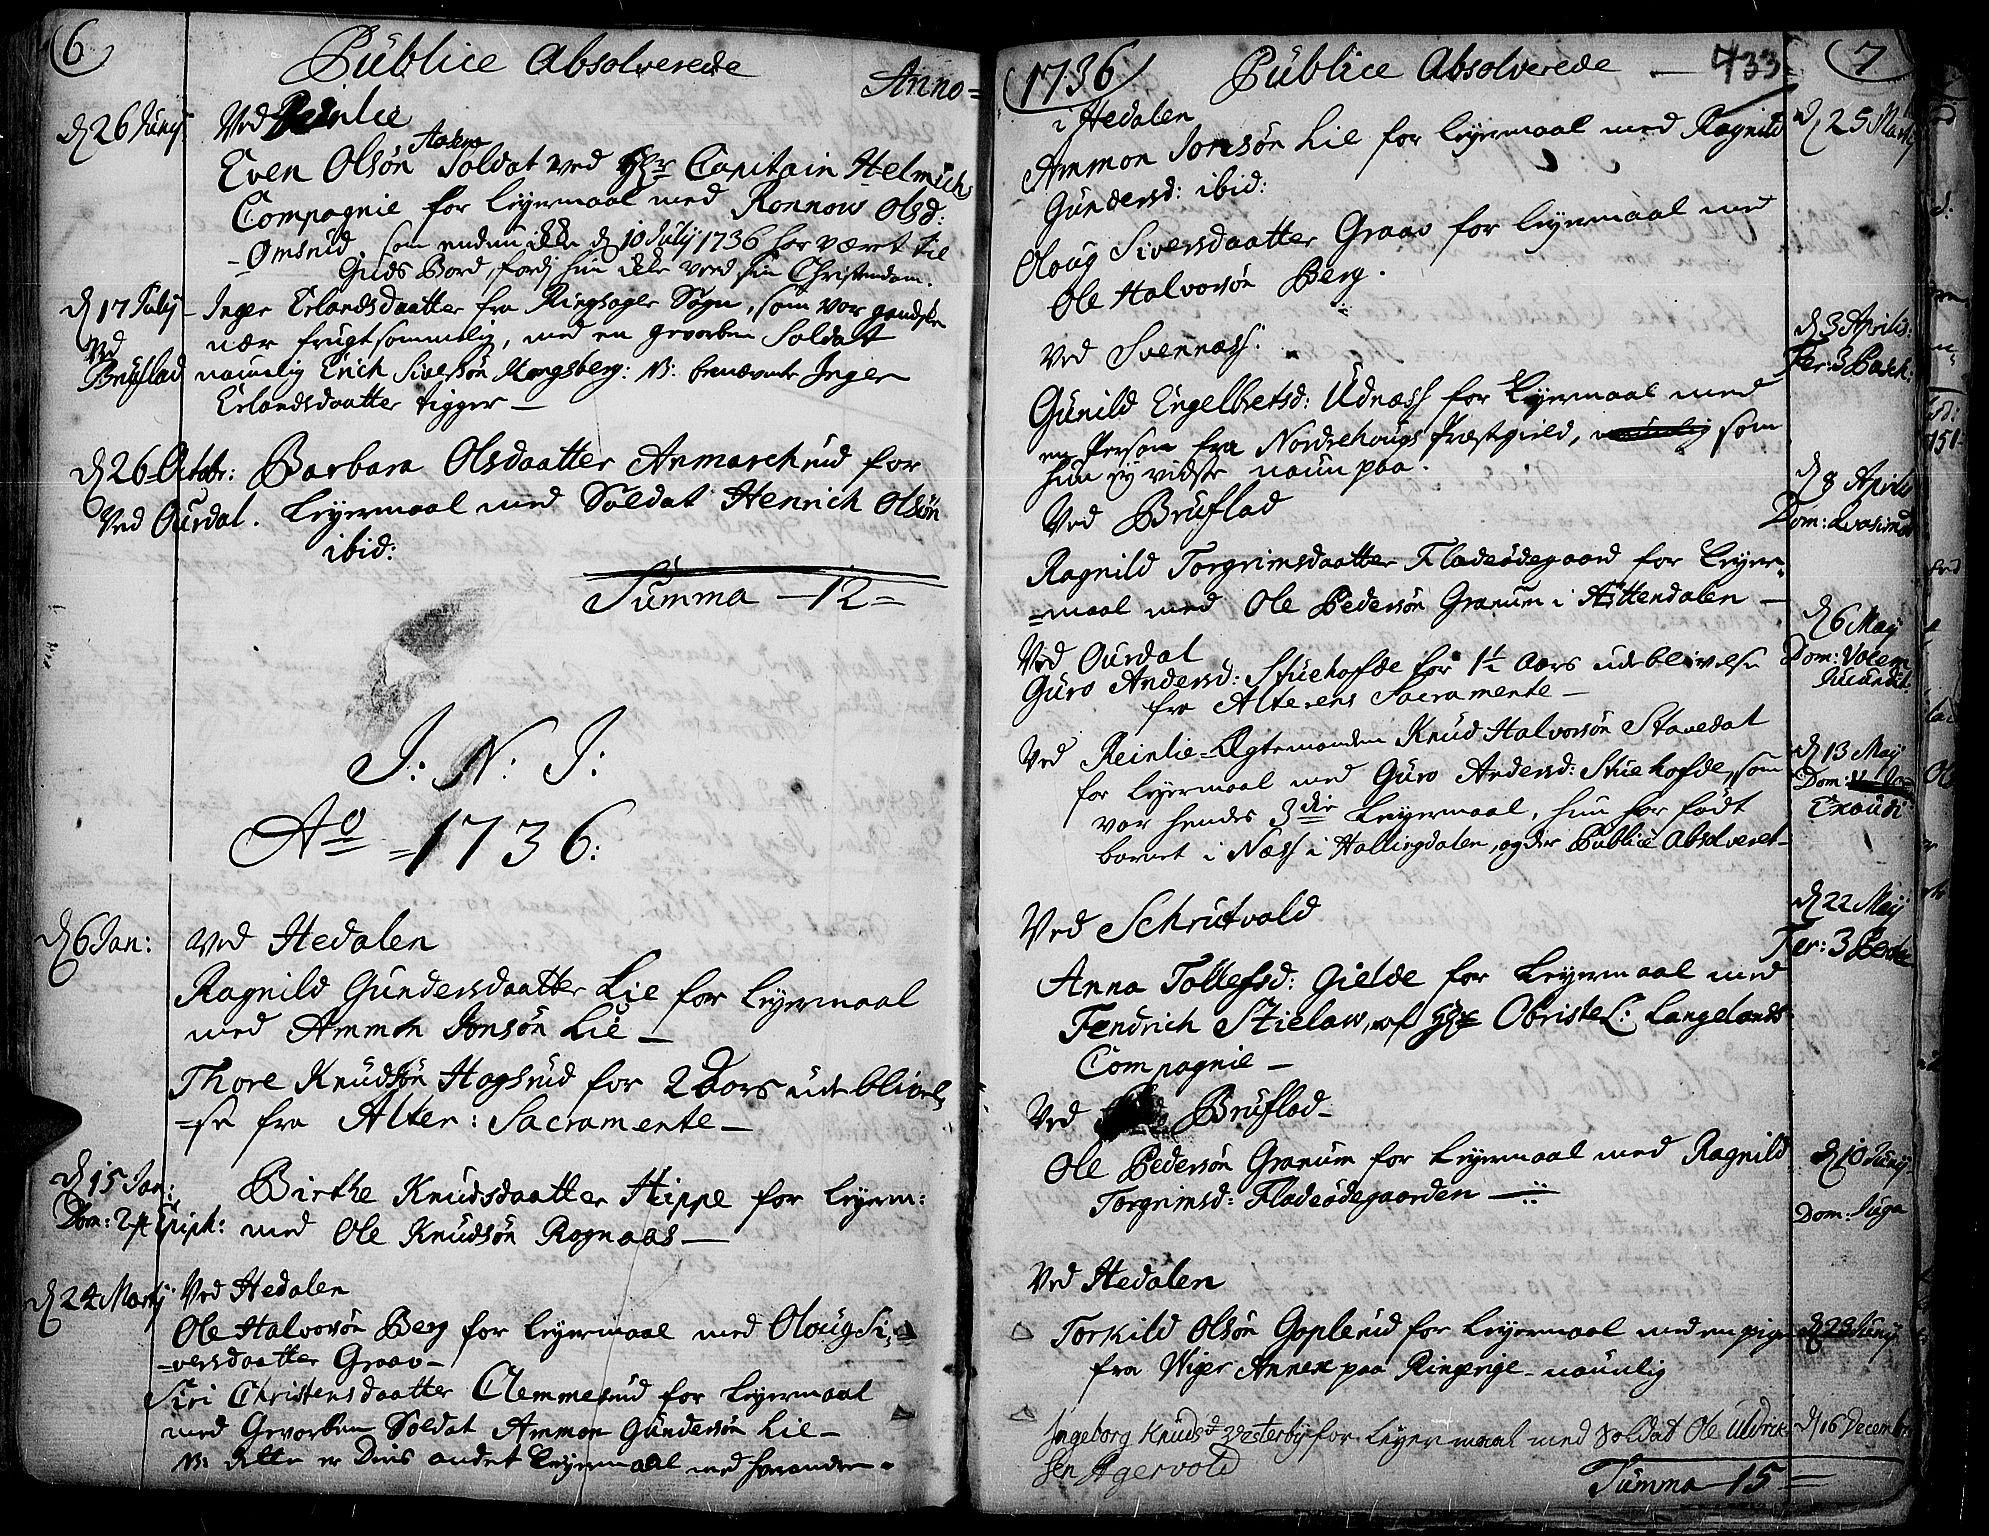 SAH, Aurdal prestekontor, Ministerialbok nr. 4, 1730-1762, s. 6-7